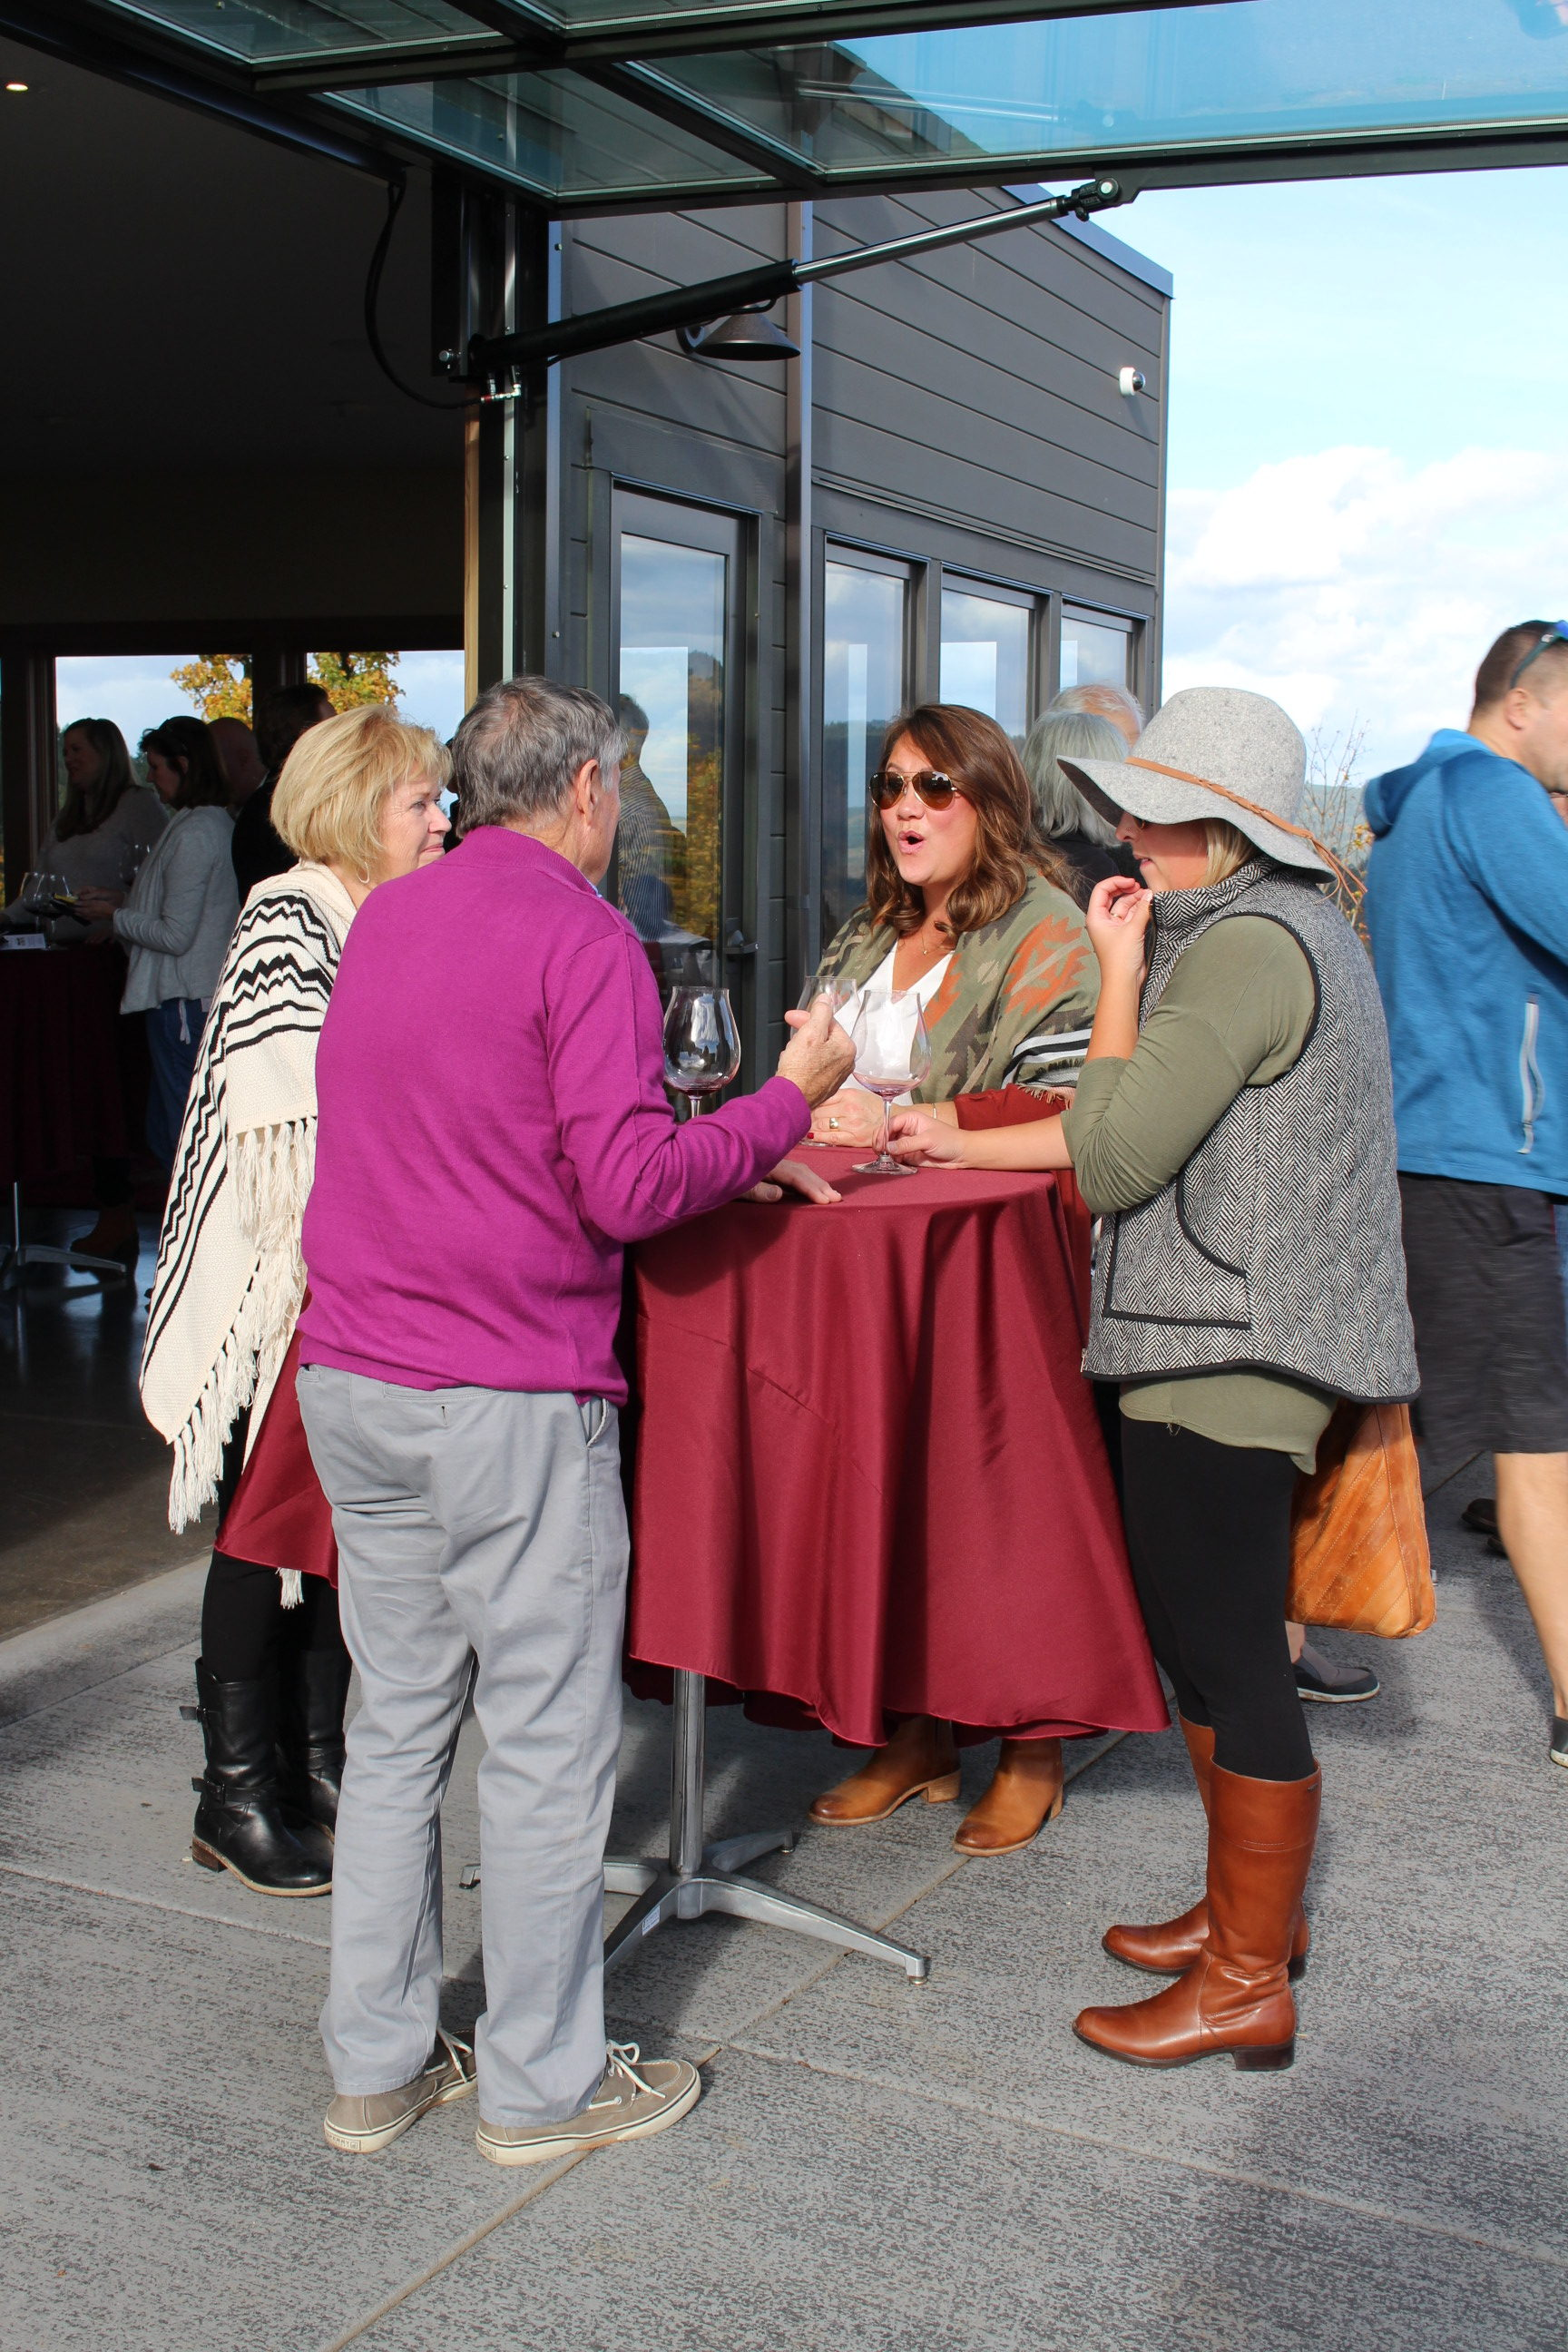 Fairsing Vineyard members enjoying the patio and fun at the 2018 fall open house